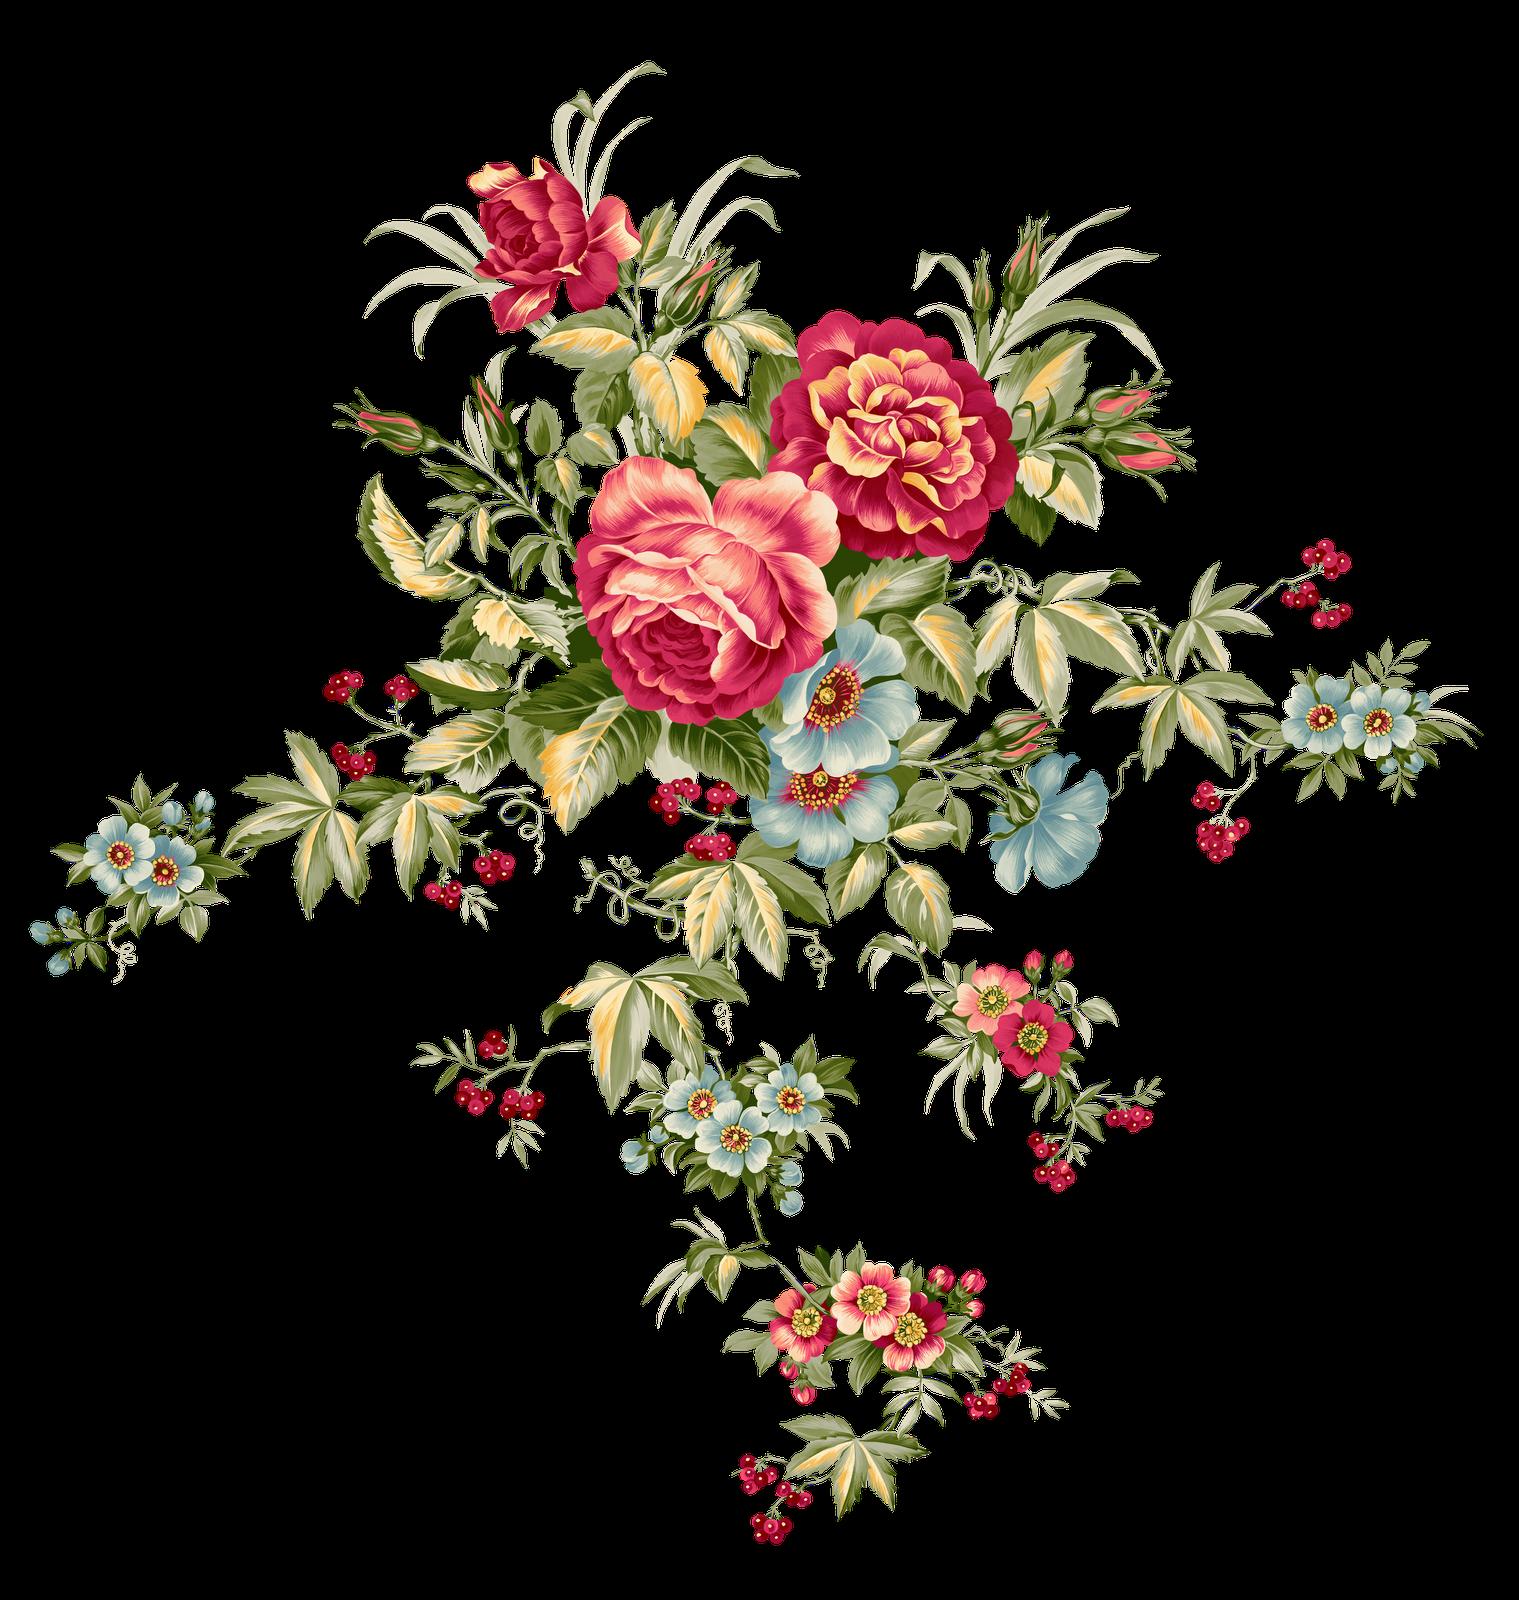 Vintage flower clipart free svg black and white png | Flower png | SYEDIMRAN | Backgrounds | Pinterest | Flower and ... svg black and white